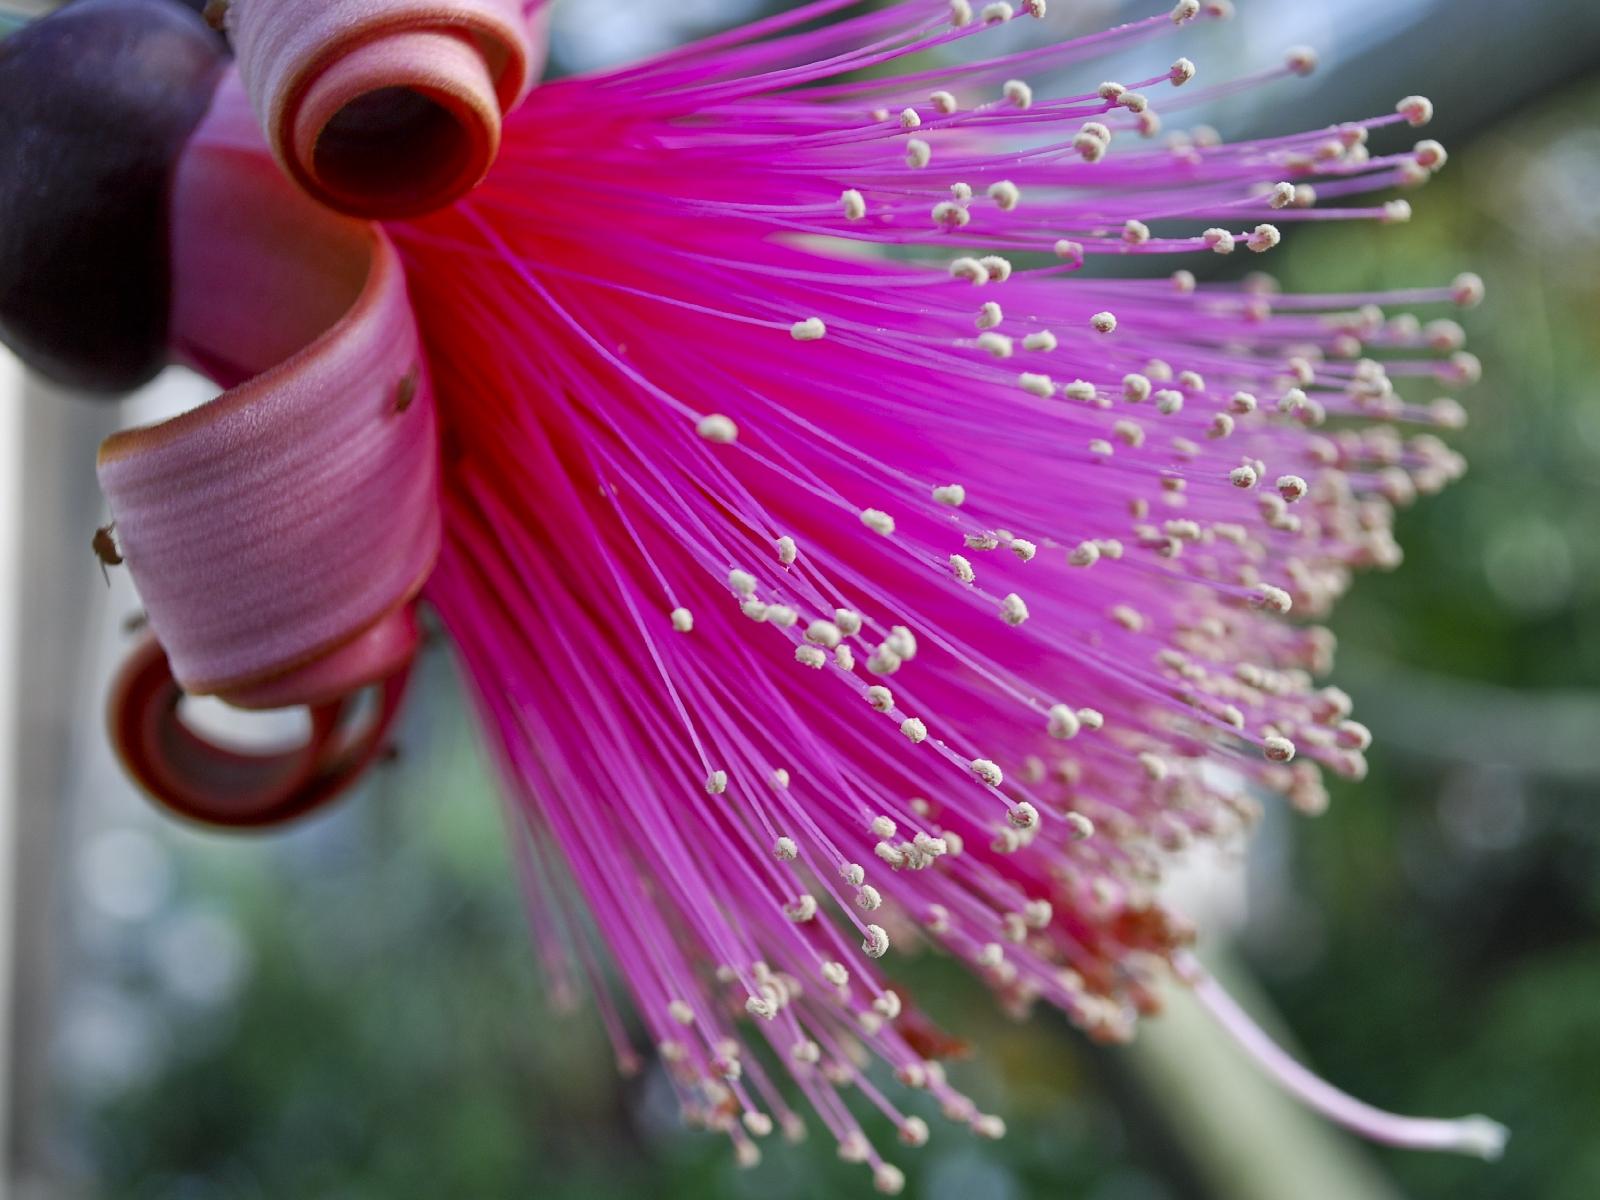 Нажмите на картинку, чтобы увеличить ...: www.kartinki24.ru/kartinki/flowers/9525.html